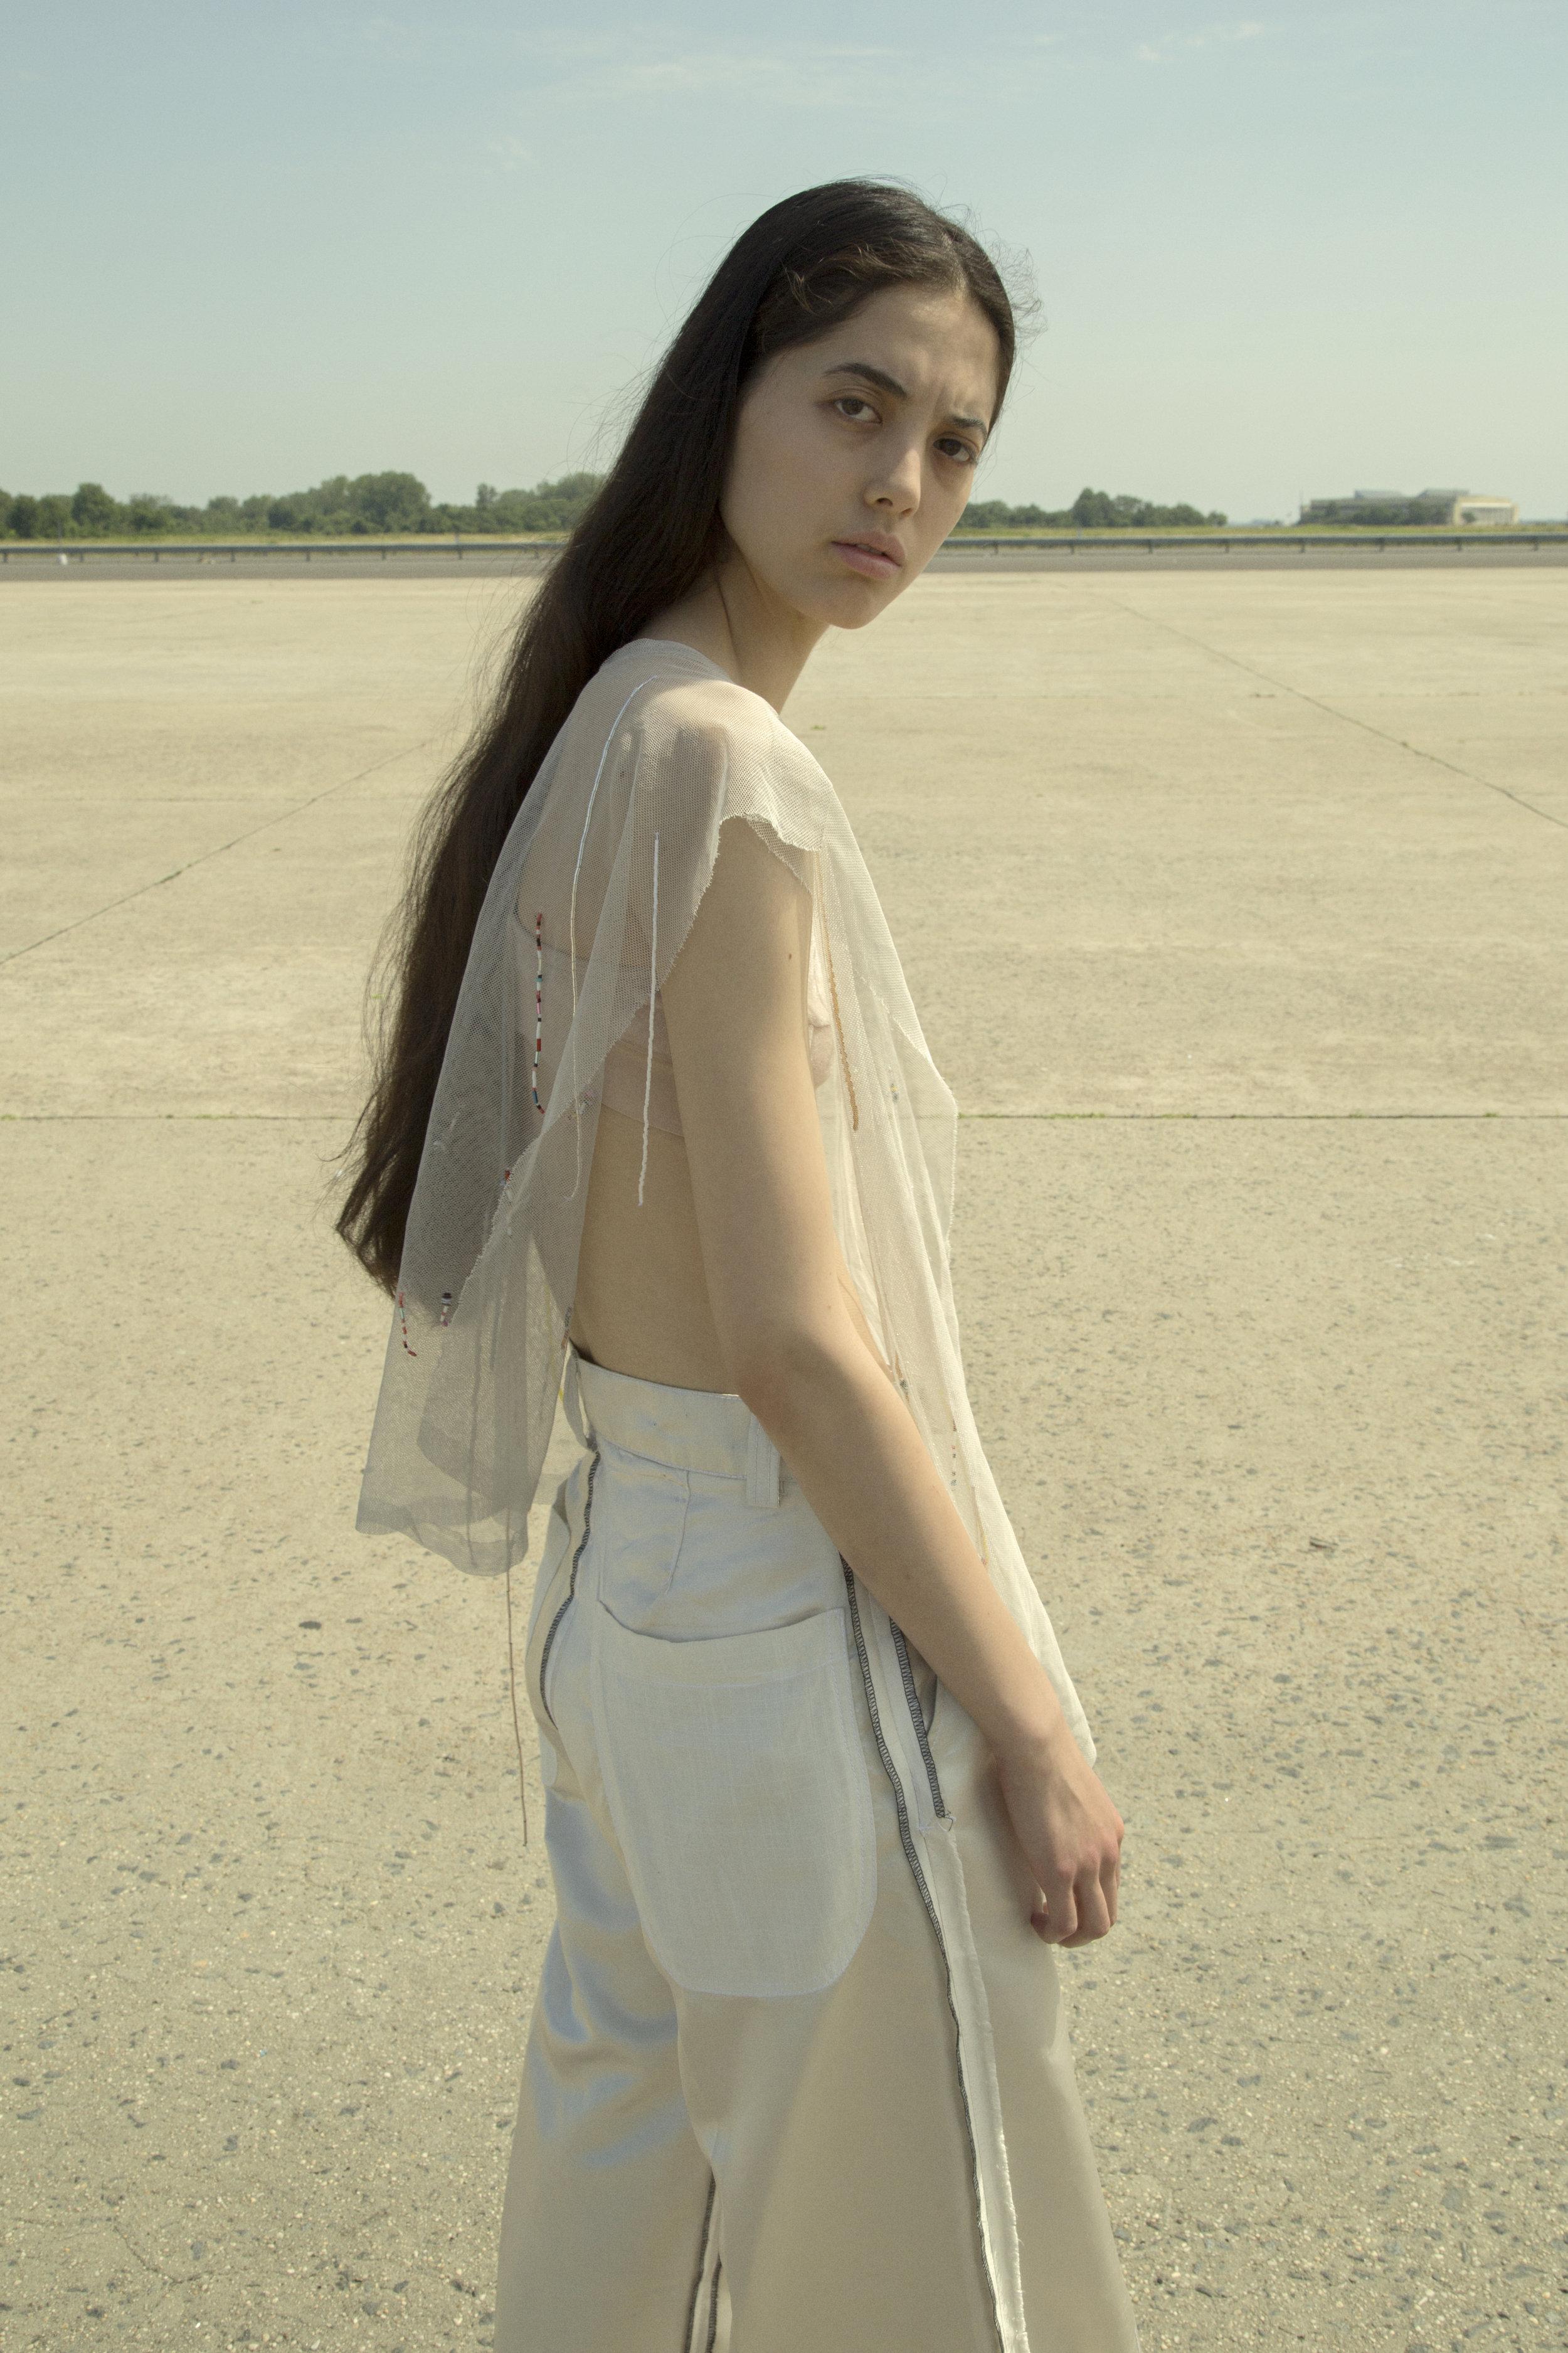 sophie andes-gascon  top, baserange  bra, carl jan cruz  trousers